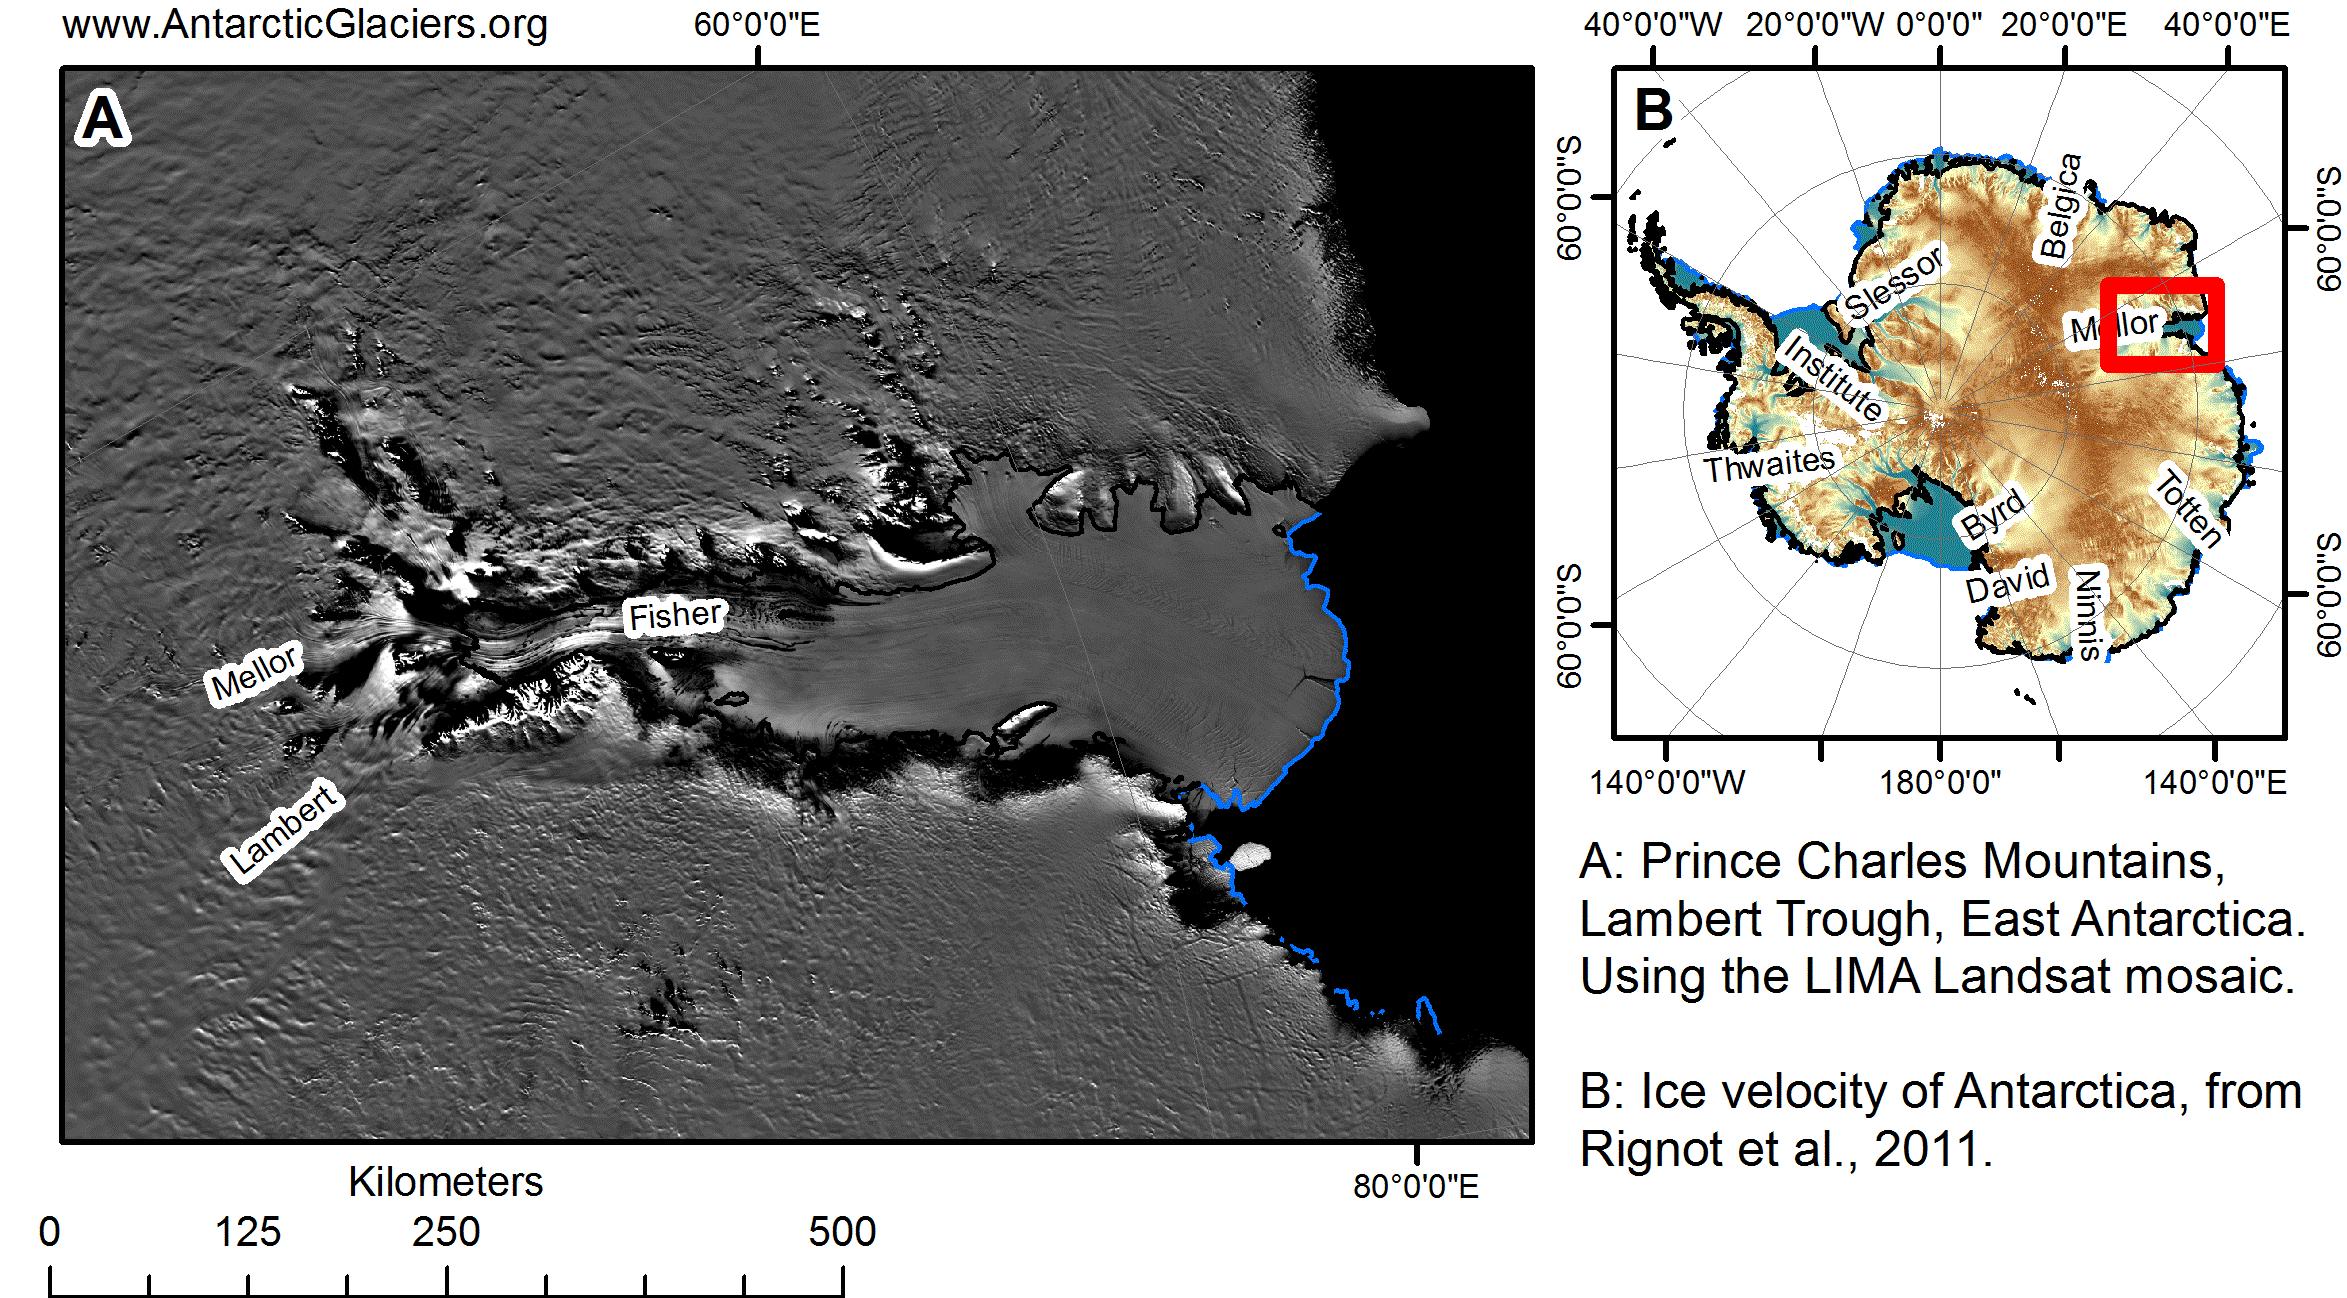 East Antarctic Ice Sheet Antarcticglaciers Org